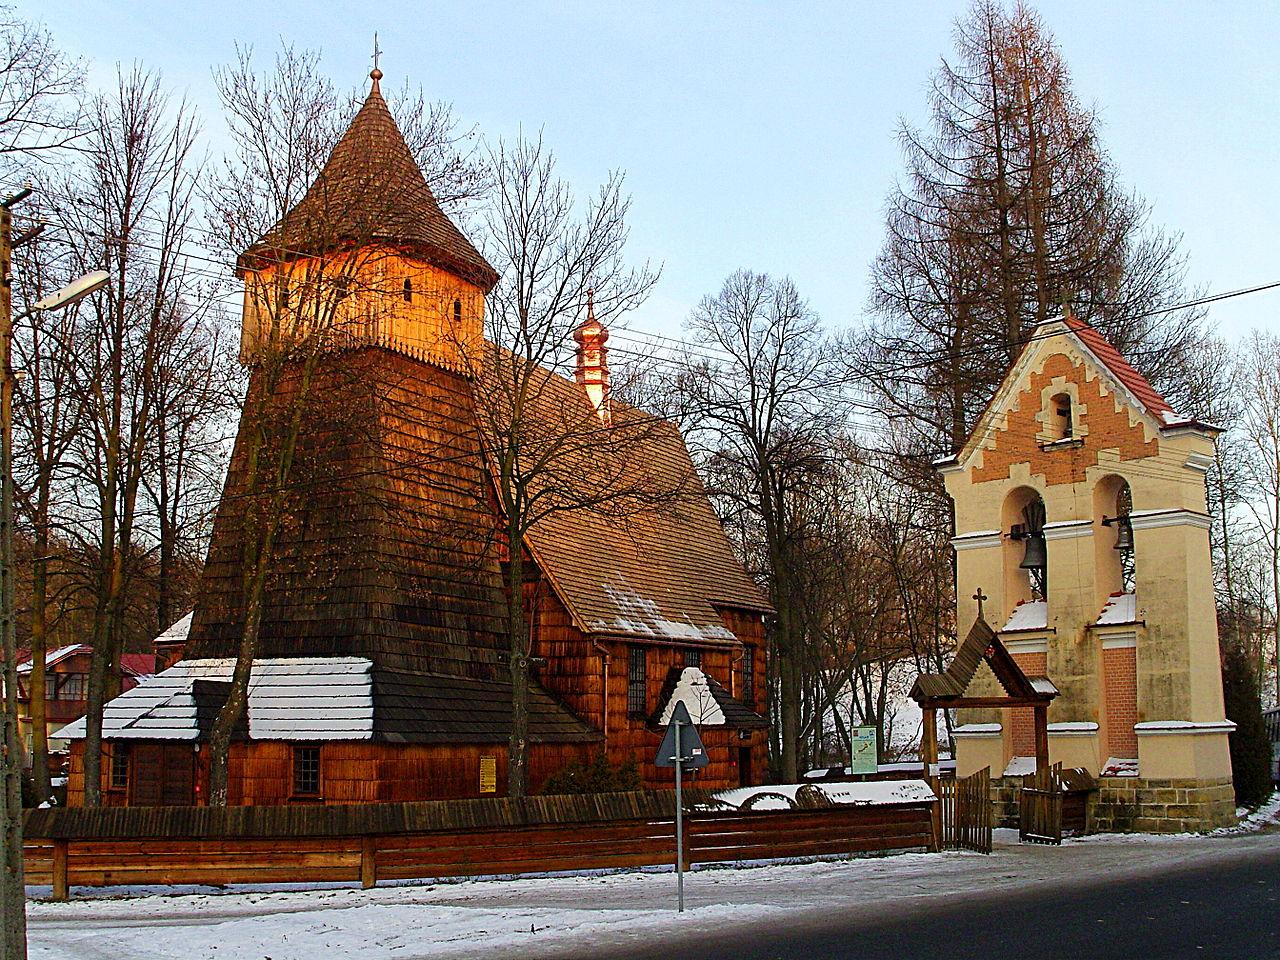 Église Saint-Michel-Archange, Binarowa